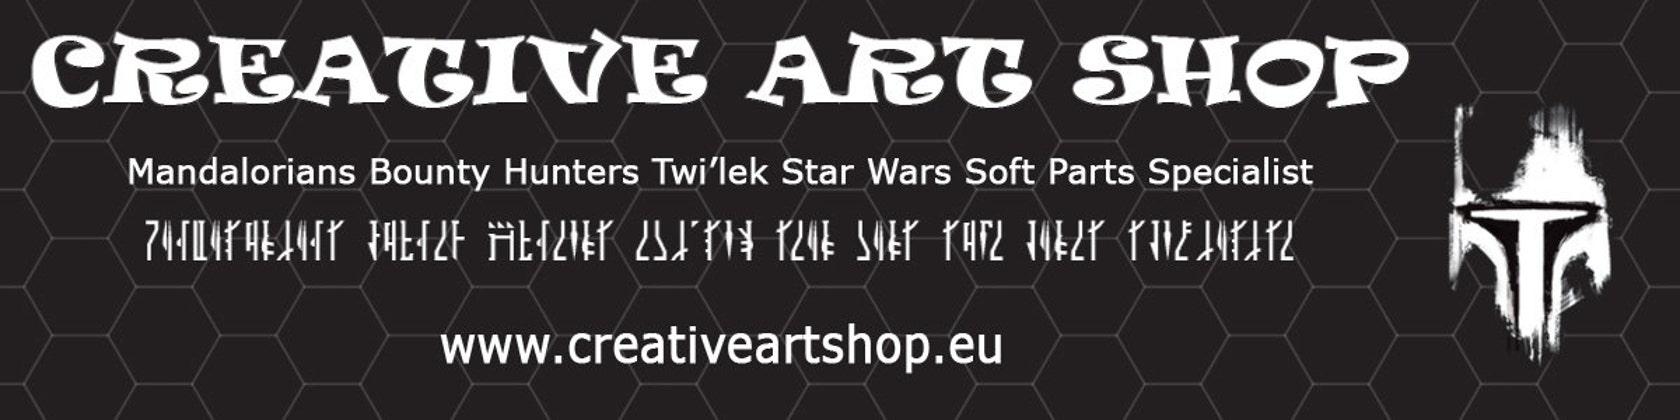 Enchanting Star Wars Häkelarbeithut Muster Frei Ornament - Decke ...